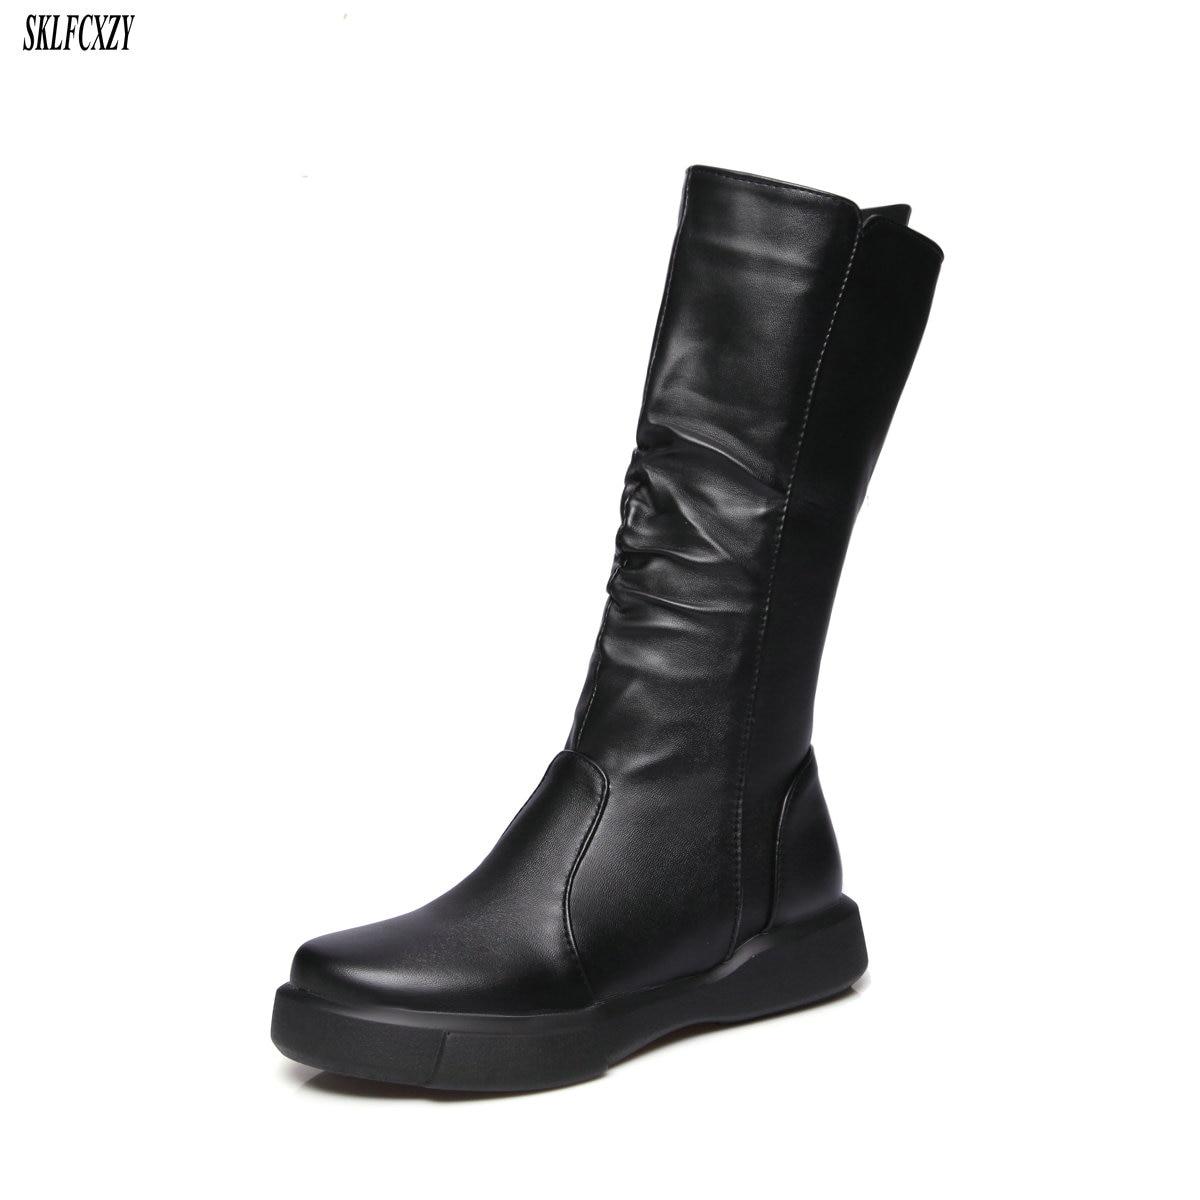 1e45c409eb3 Medio Cómodas Otoño Zapatos Mujeres blanco Nuevas Tamaño Planos Cremallera  Tubo 43 34 Moda Botas 2018 De Negro tzXSvwBq